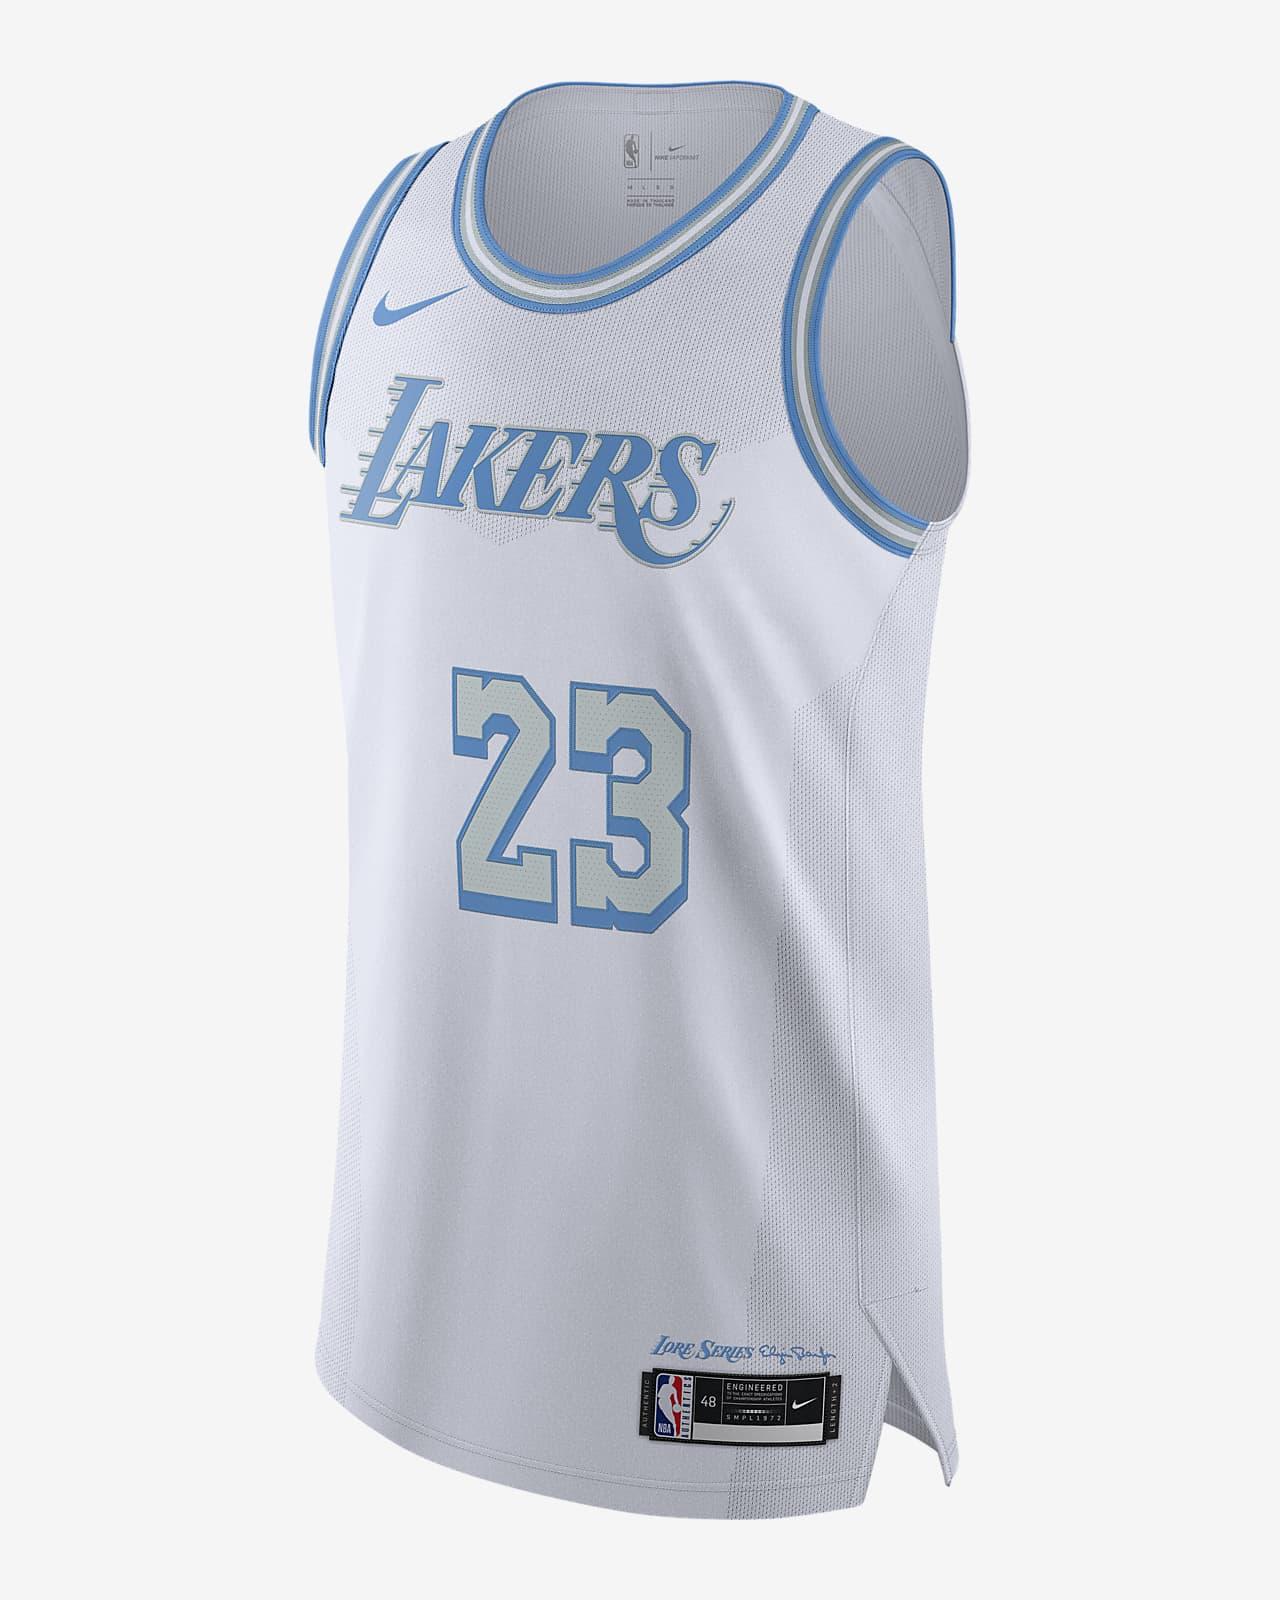 Camiseta Nike NBA Authentic Los Angeles Lakers City Edition